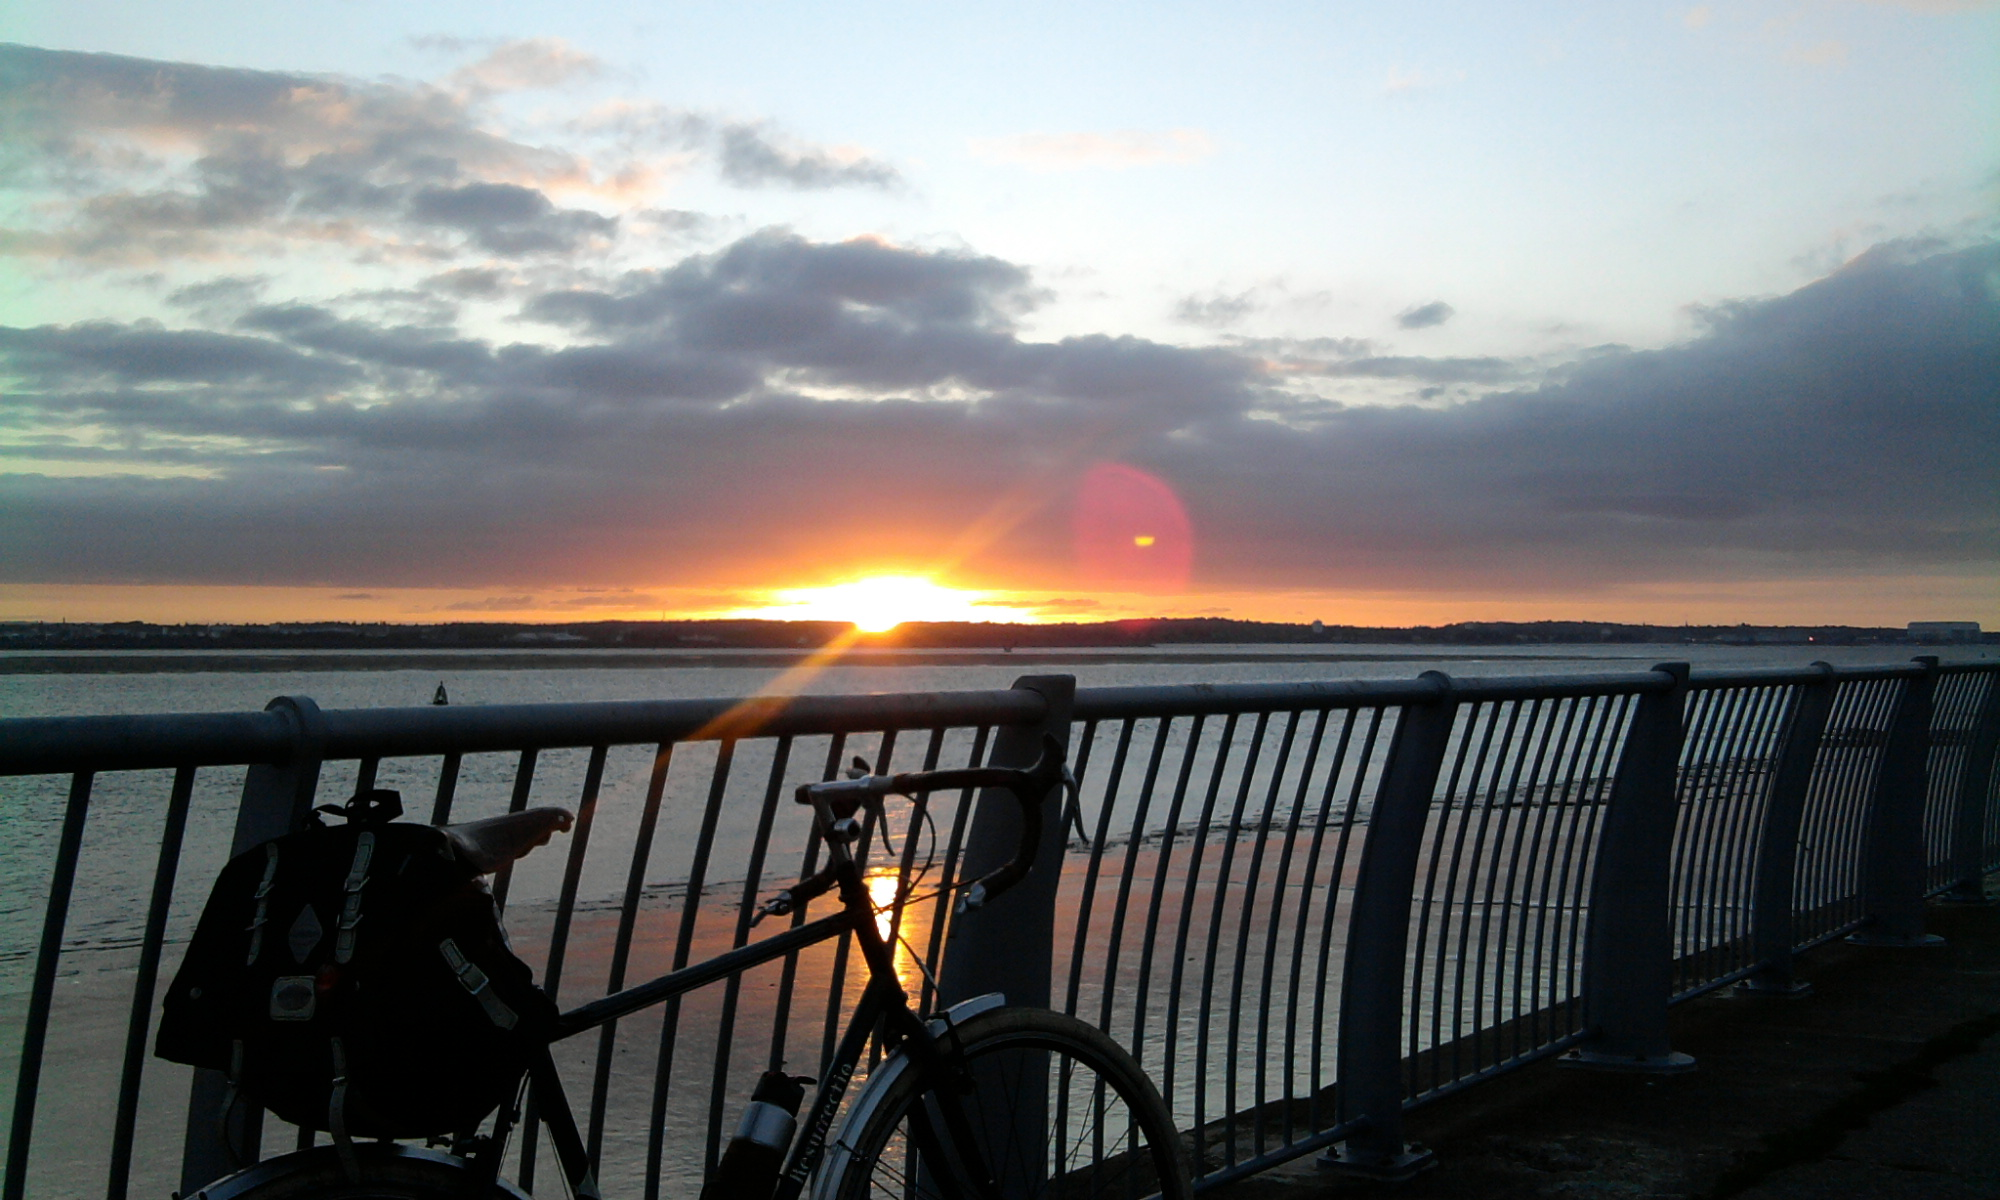 Bike? Check. Beautiful evening? Check. Happy Rider? O yes...